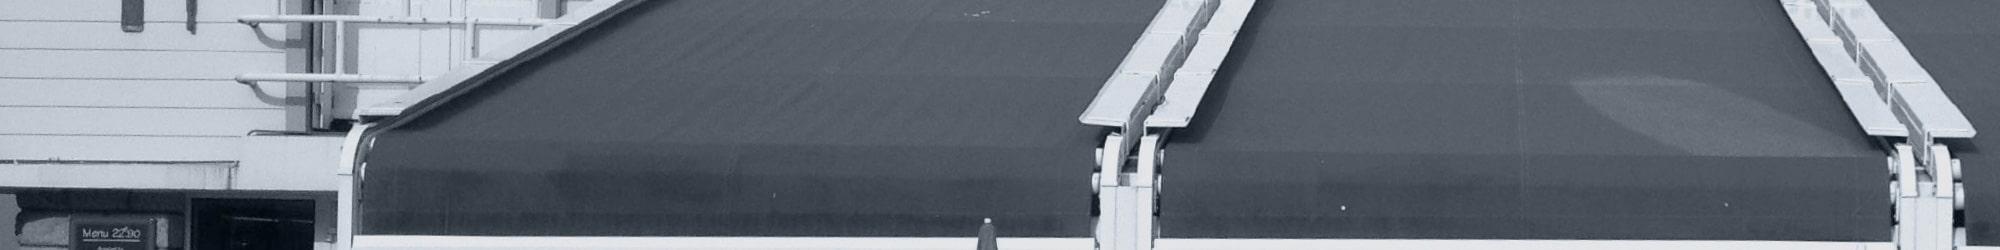 bandeau avancée de terrasse